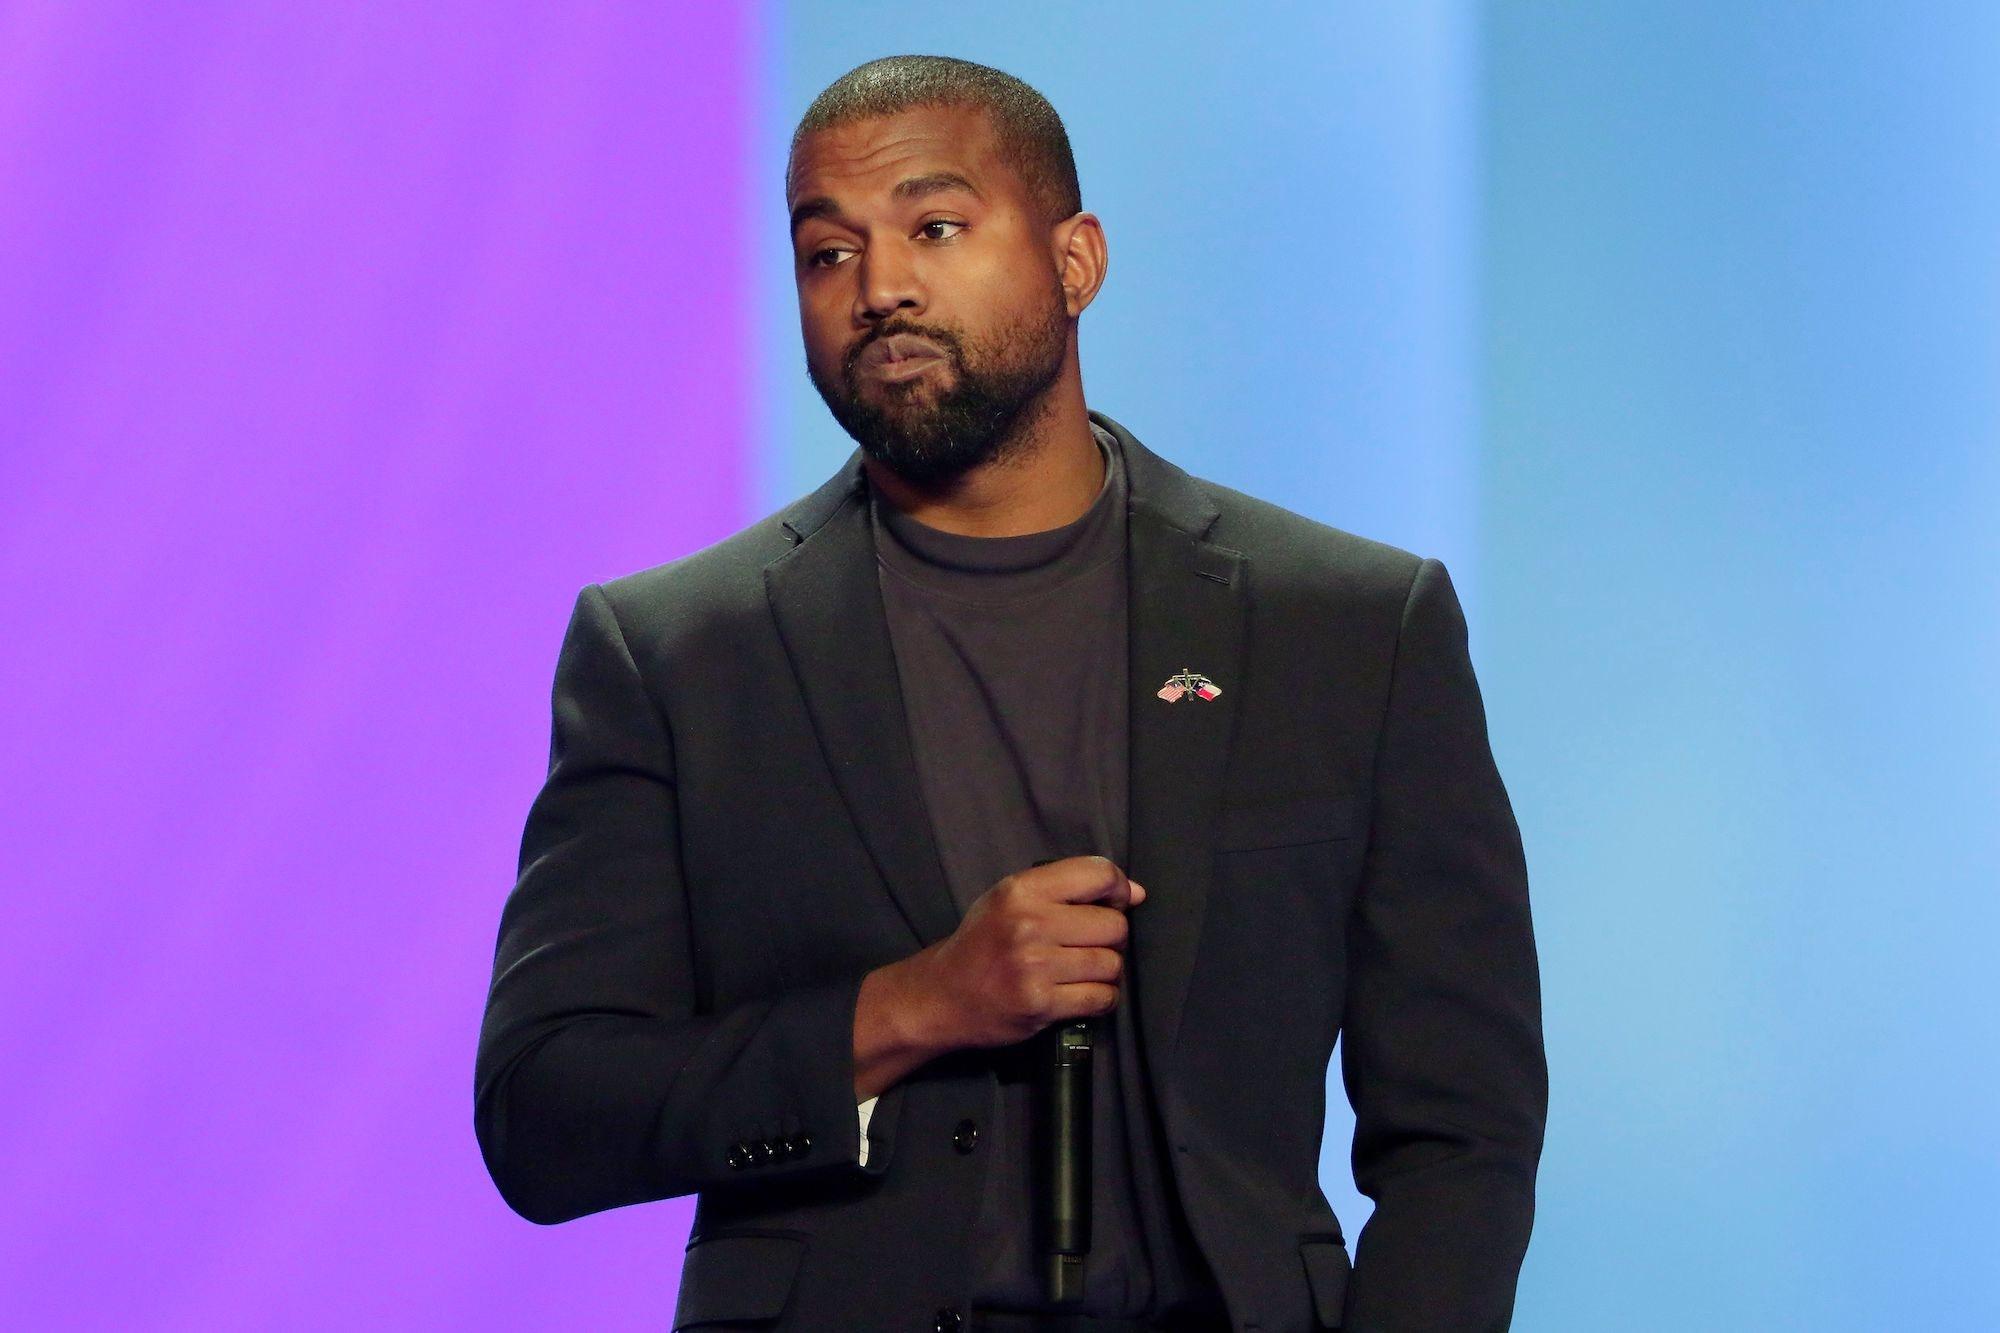 Kanye West… ούρησε ένα από τα βραβείo Grammy